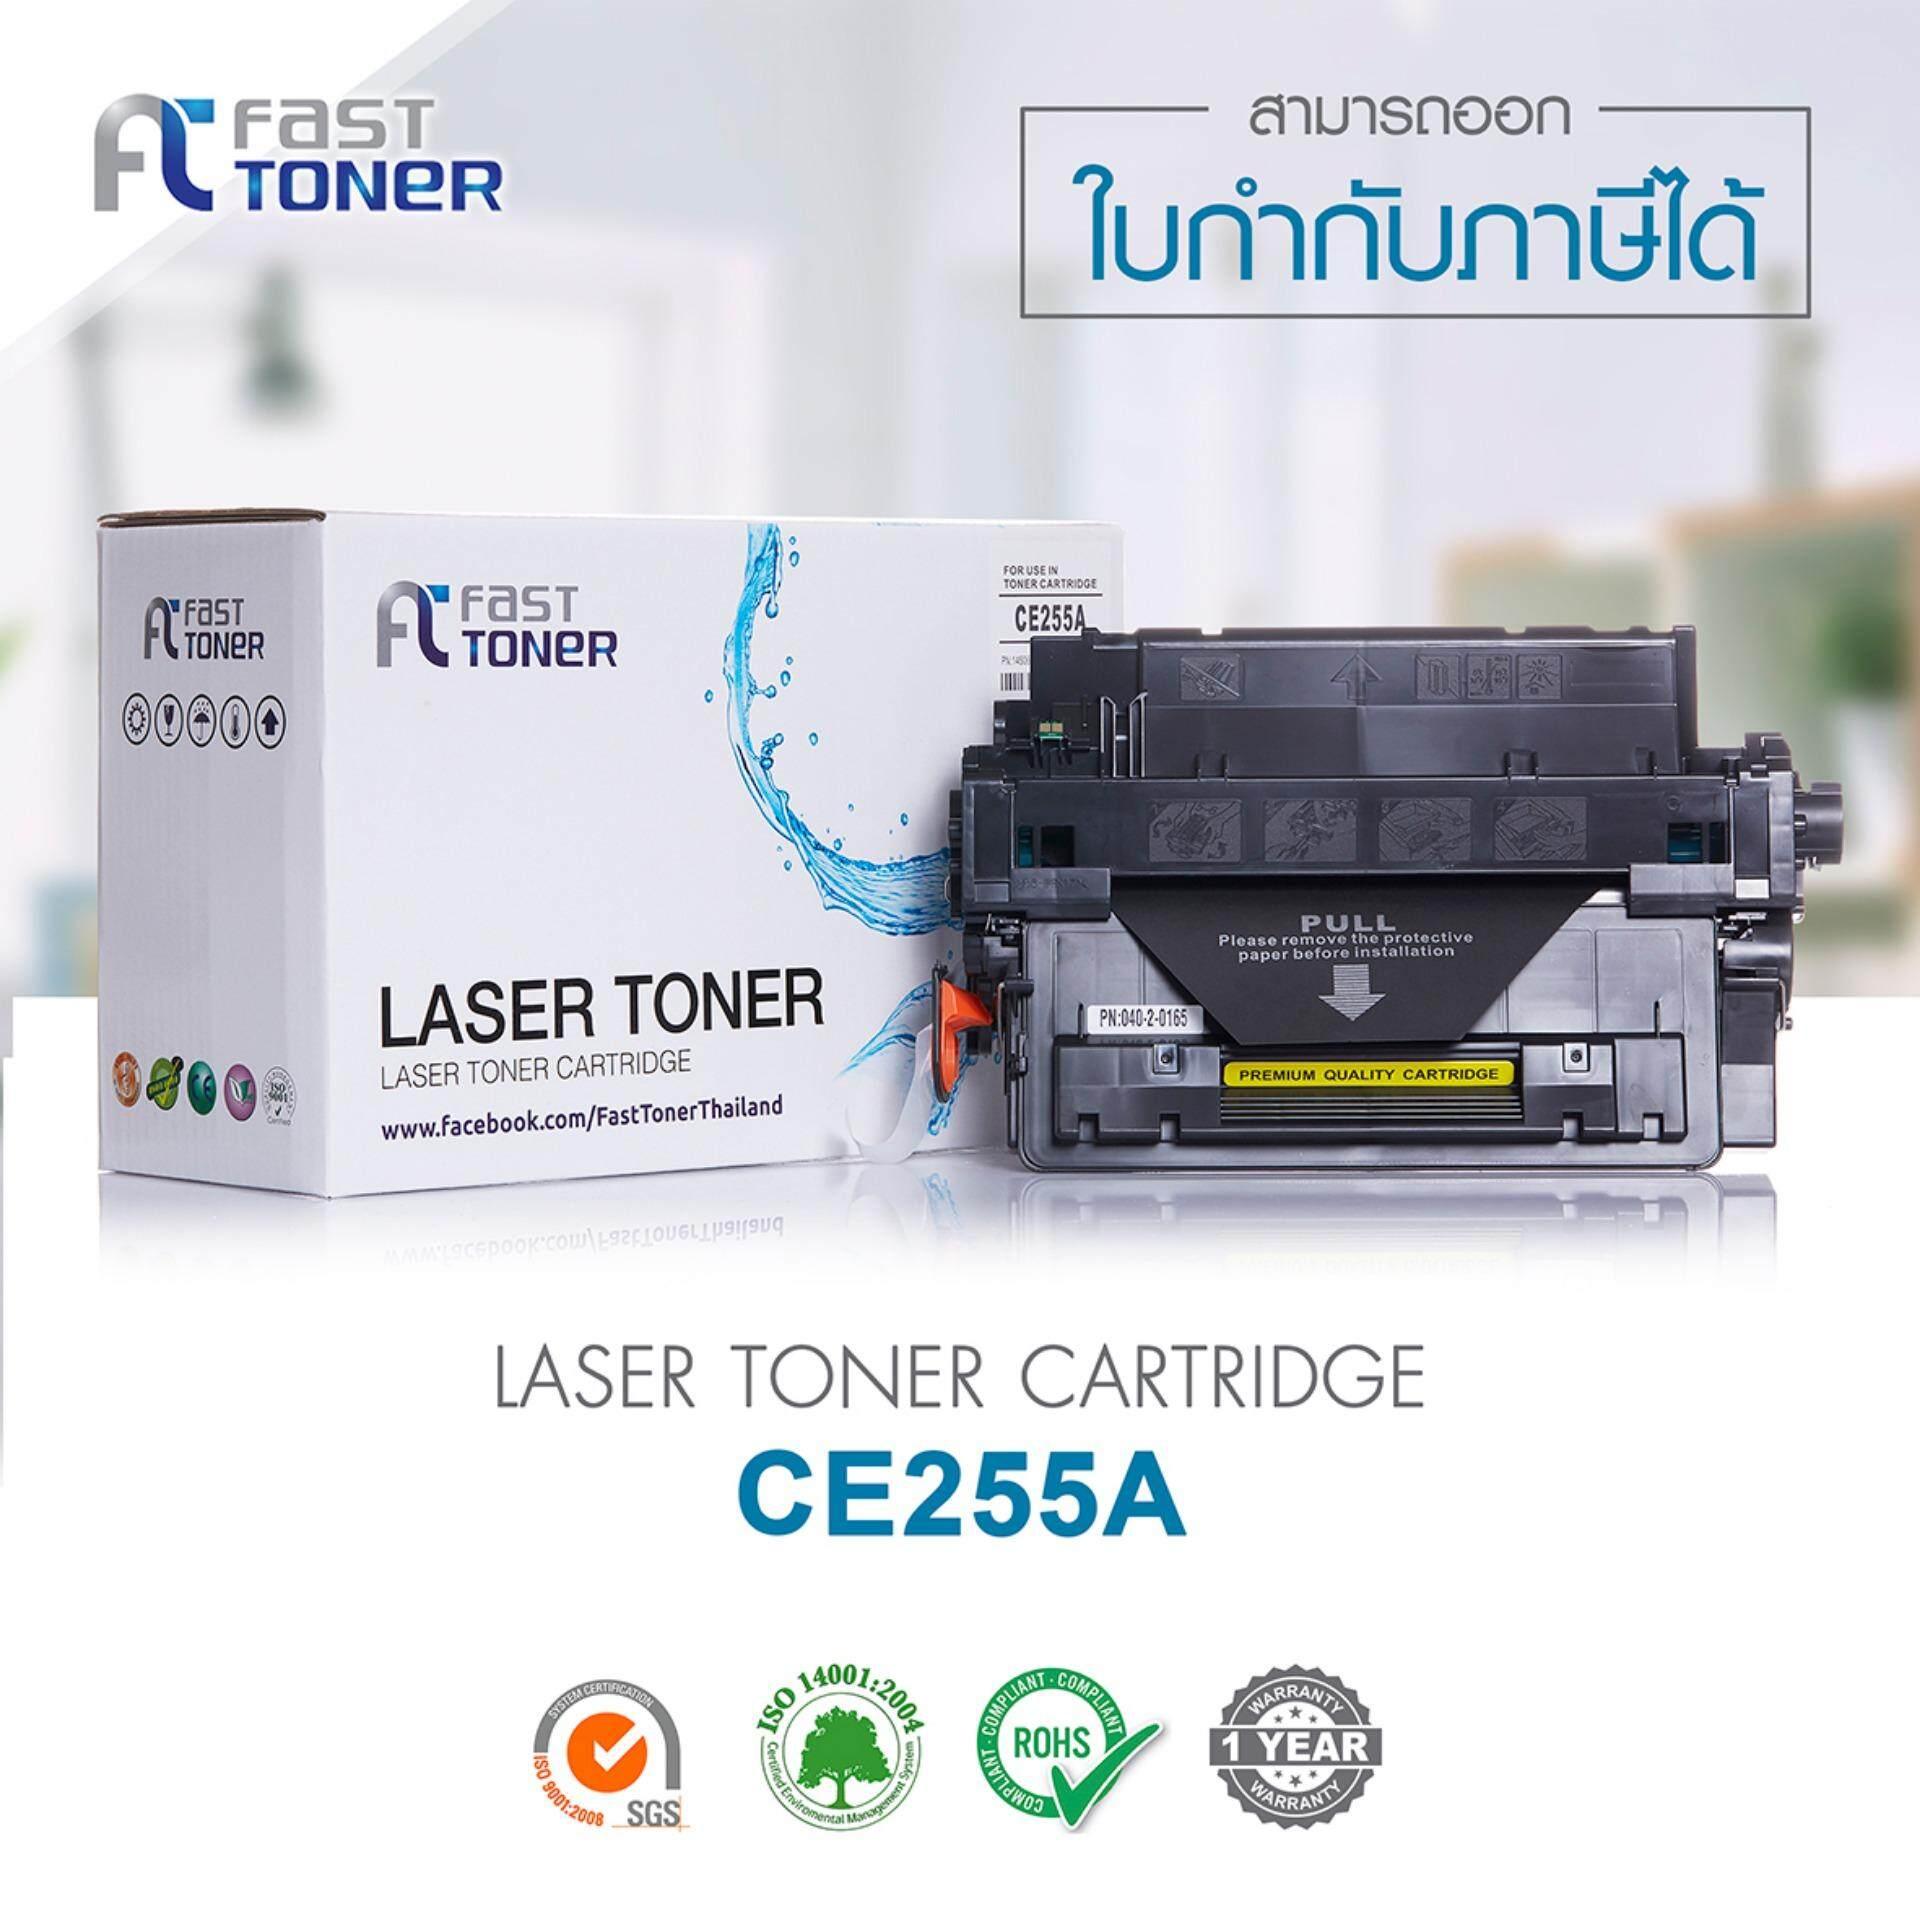 Fast Toner ตลับหมึกเลเซอร์ Hp Ce255A สำหรับเครื่องปริ้น Hp Laserjet P3010 P3015 P3015D P3015Dn P3015X สีดำ Fast Toner ตลับหมึกเลเซอร์ Hp Ce255A สำหรับเครื่องปริ้น Hp Laserjet P3010 P3015 P3015D P3015Dn P3015X สีดำ ใหม่ล่าสุด